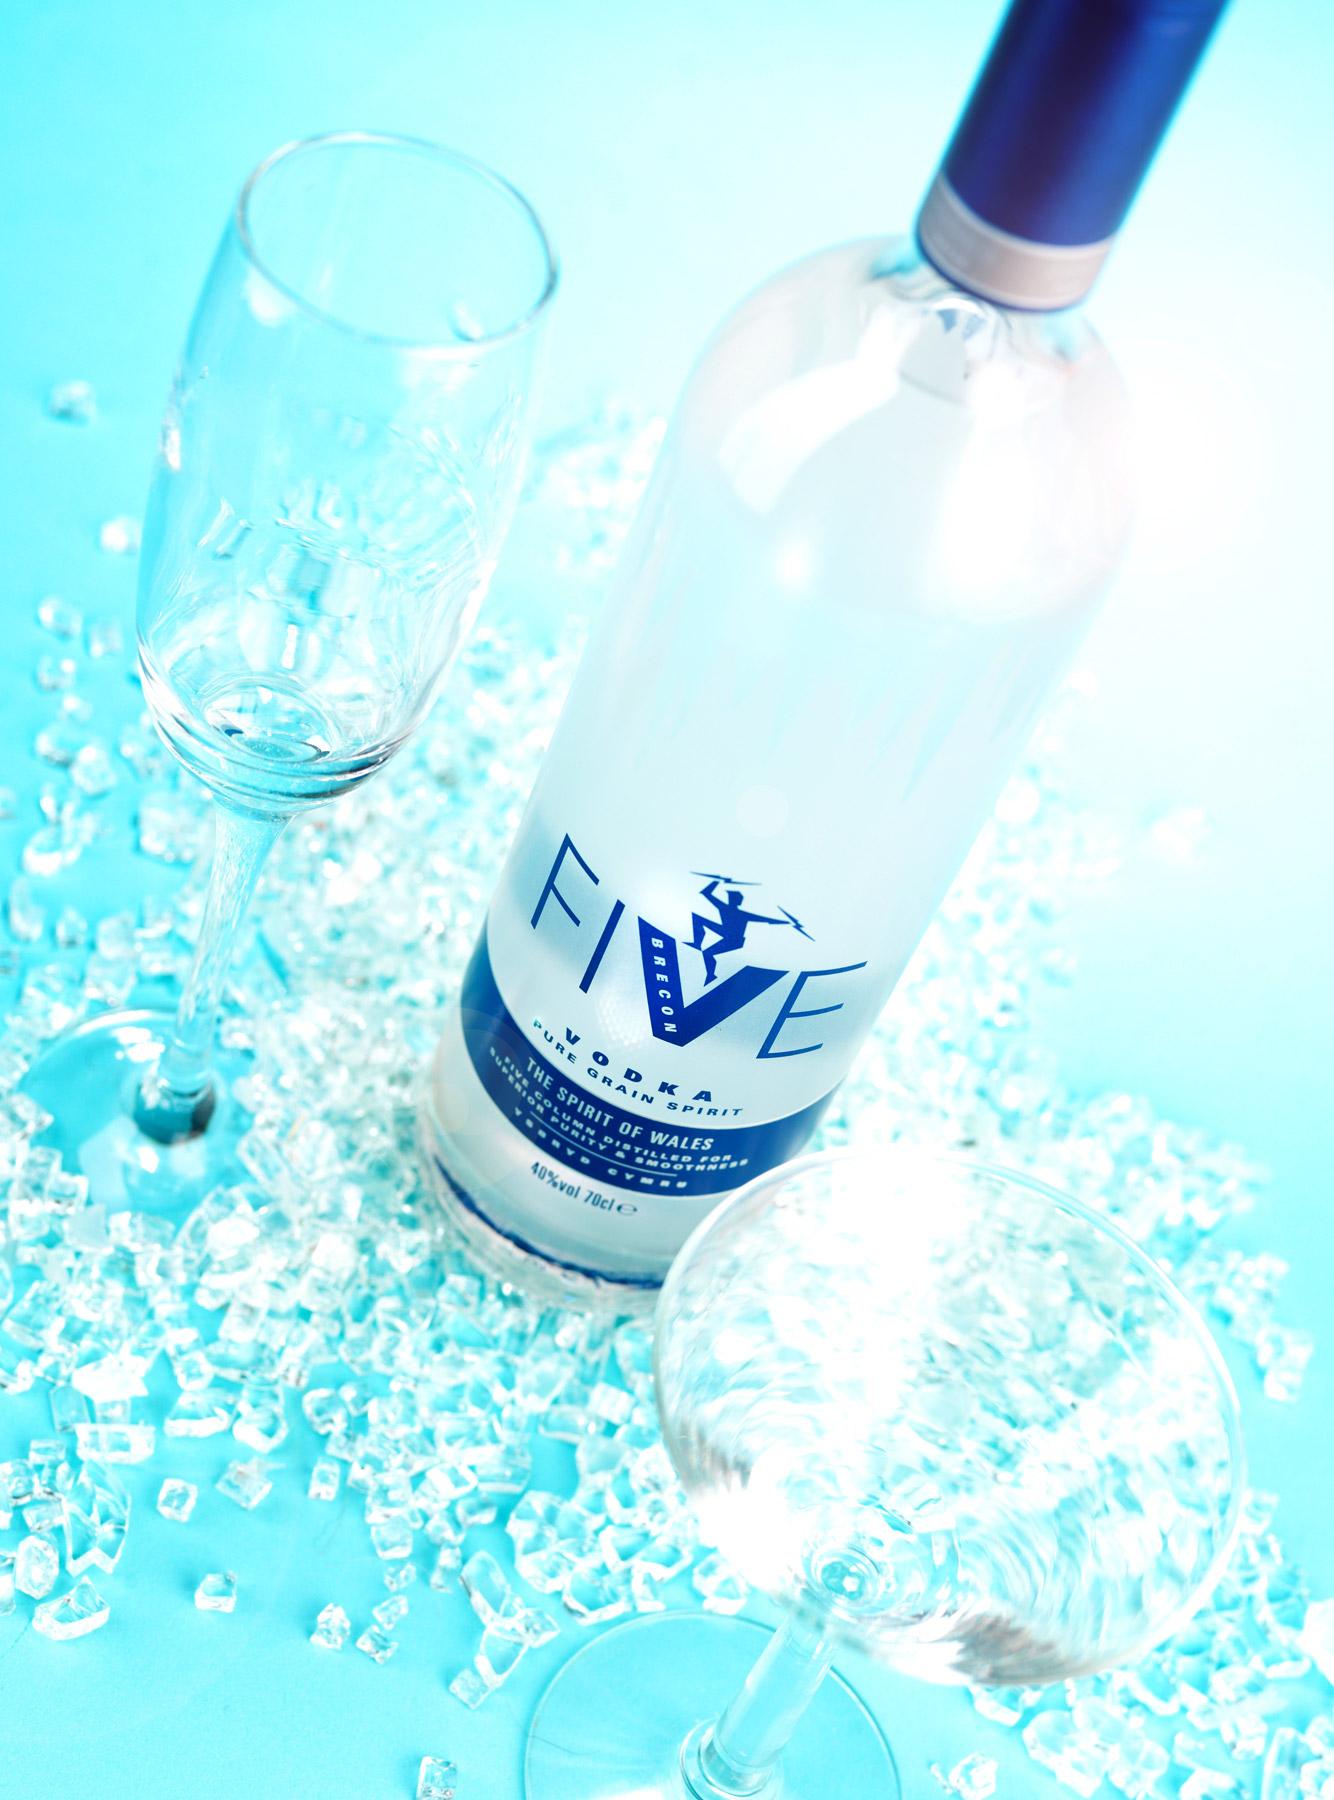 Vodka bottle shot from above on a blue background